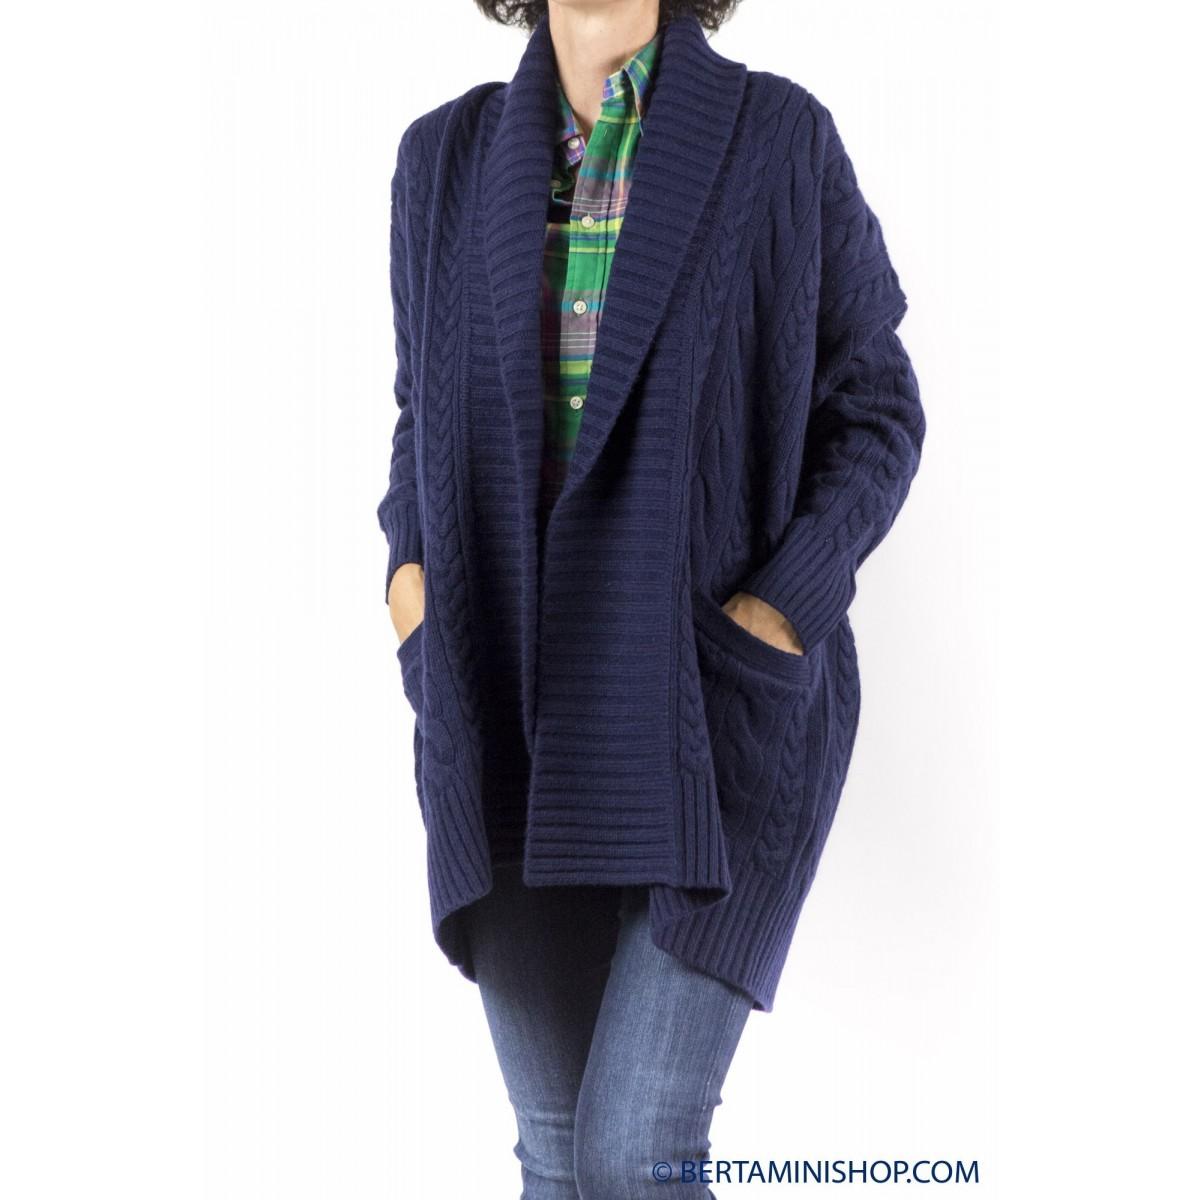 Cardigan Ralph Lauren Woman - V39Id320Wd236